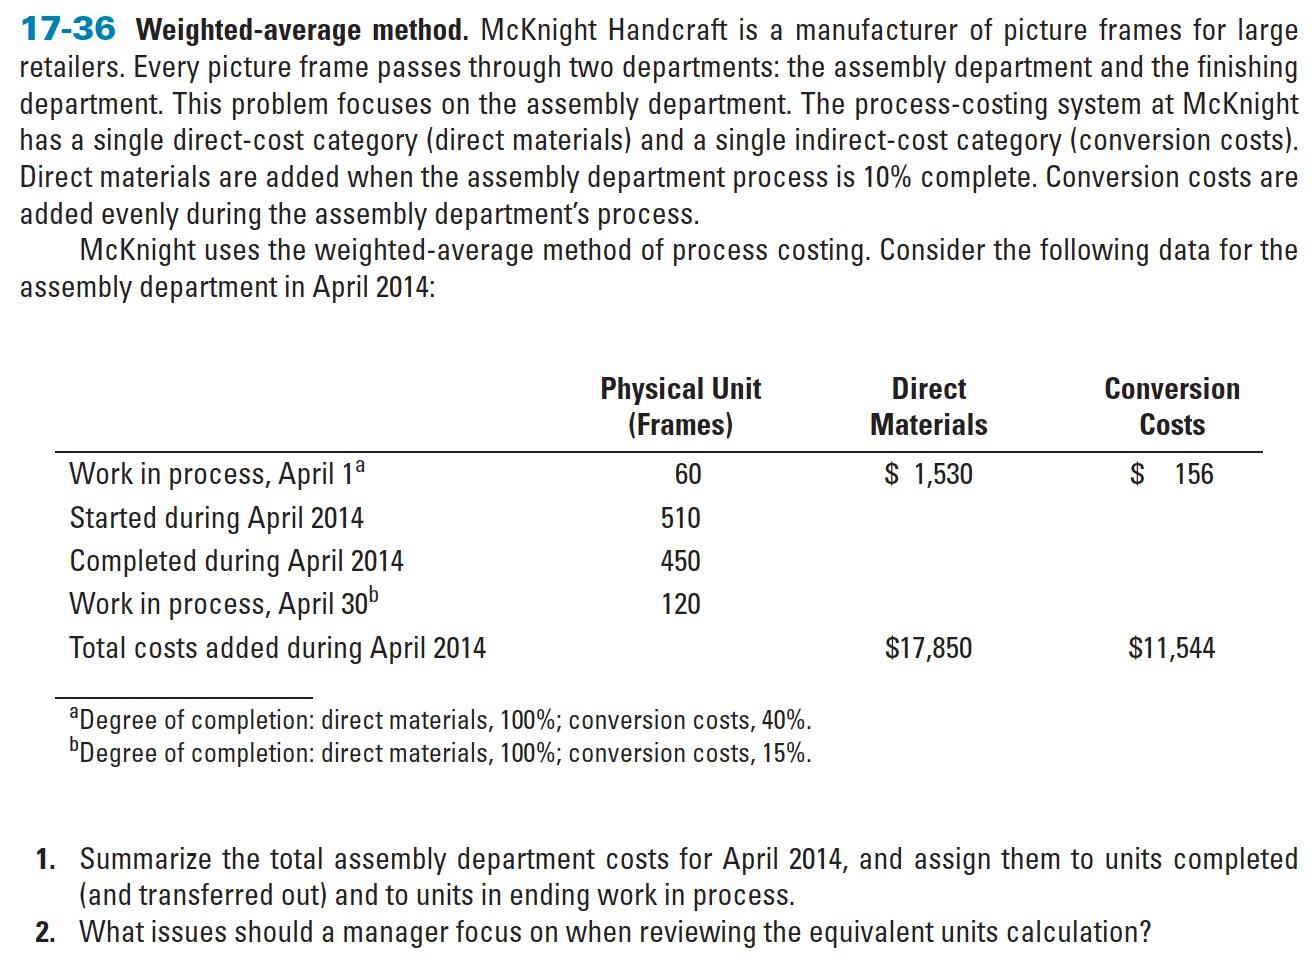 Contrast inventory costing methods LIFO FIFO